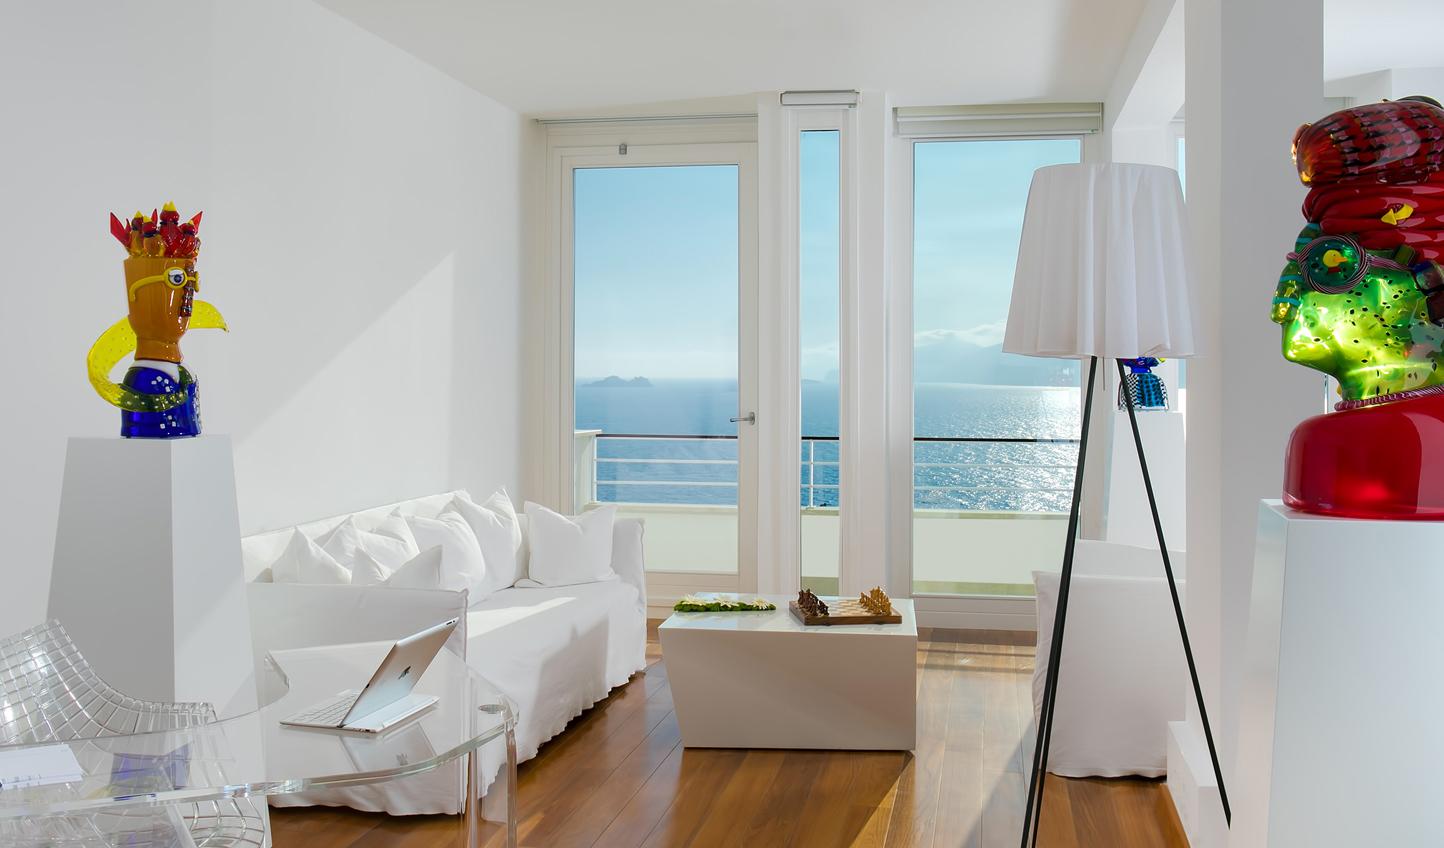 The stylish interiors at Casa Angelina